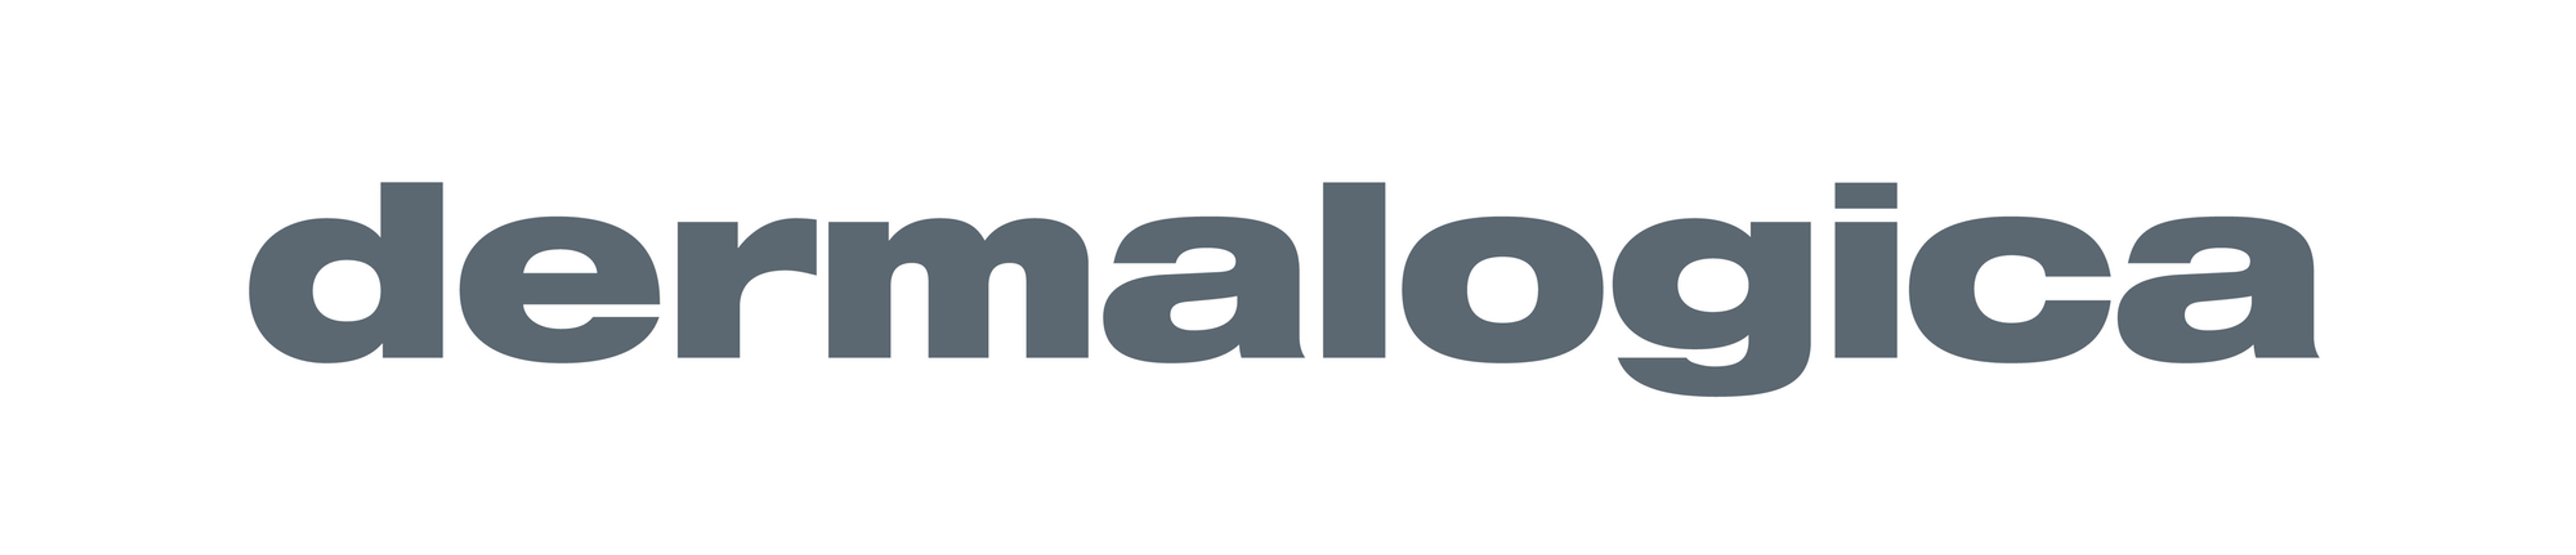 Dermalogica+Logo+-+No+Tag.jpg